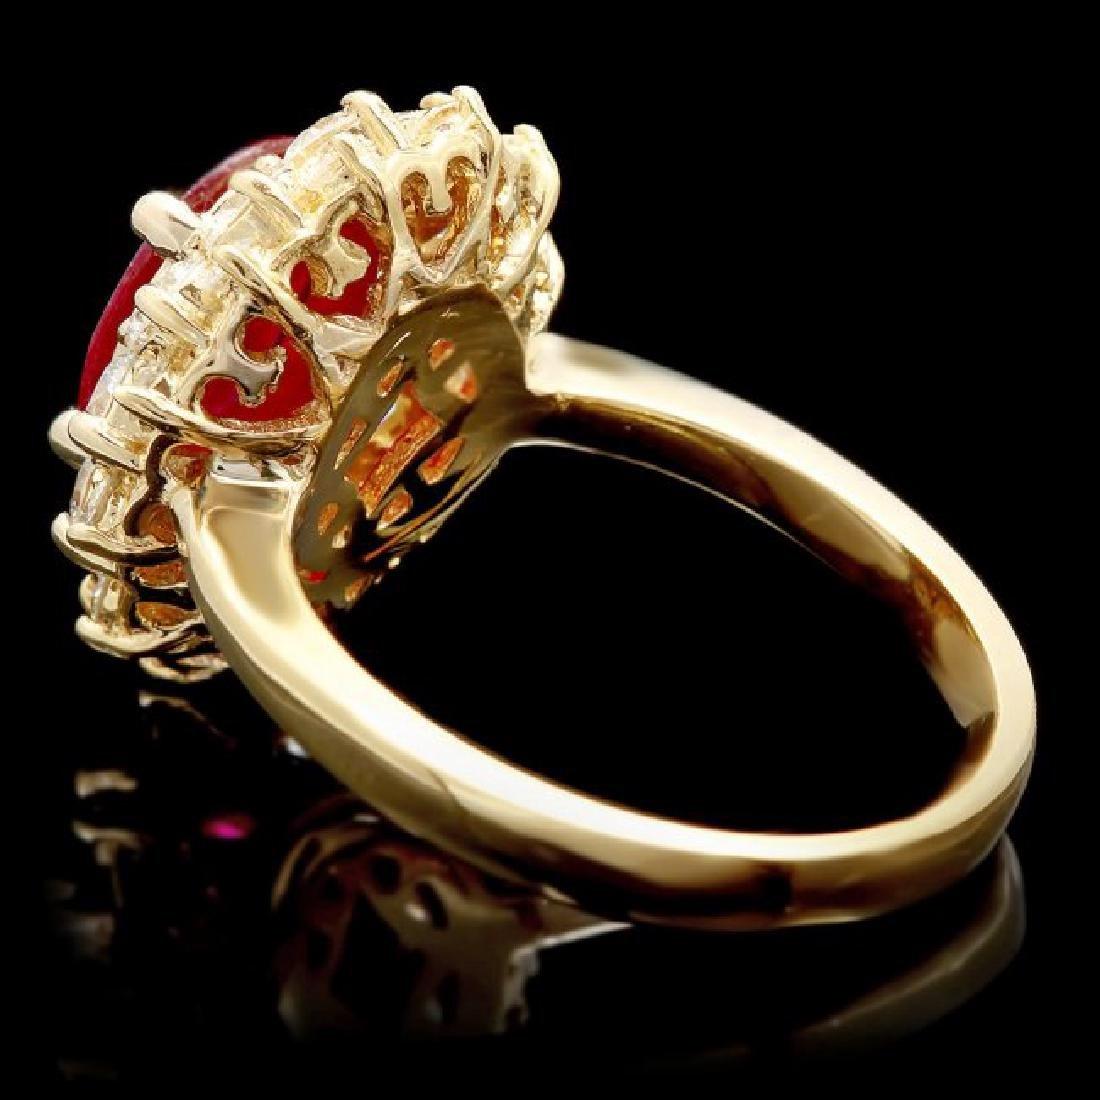 14k Yellow Gold 1.50ct Ruby 1.50ct Diamond Ring - 5